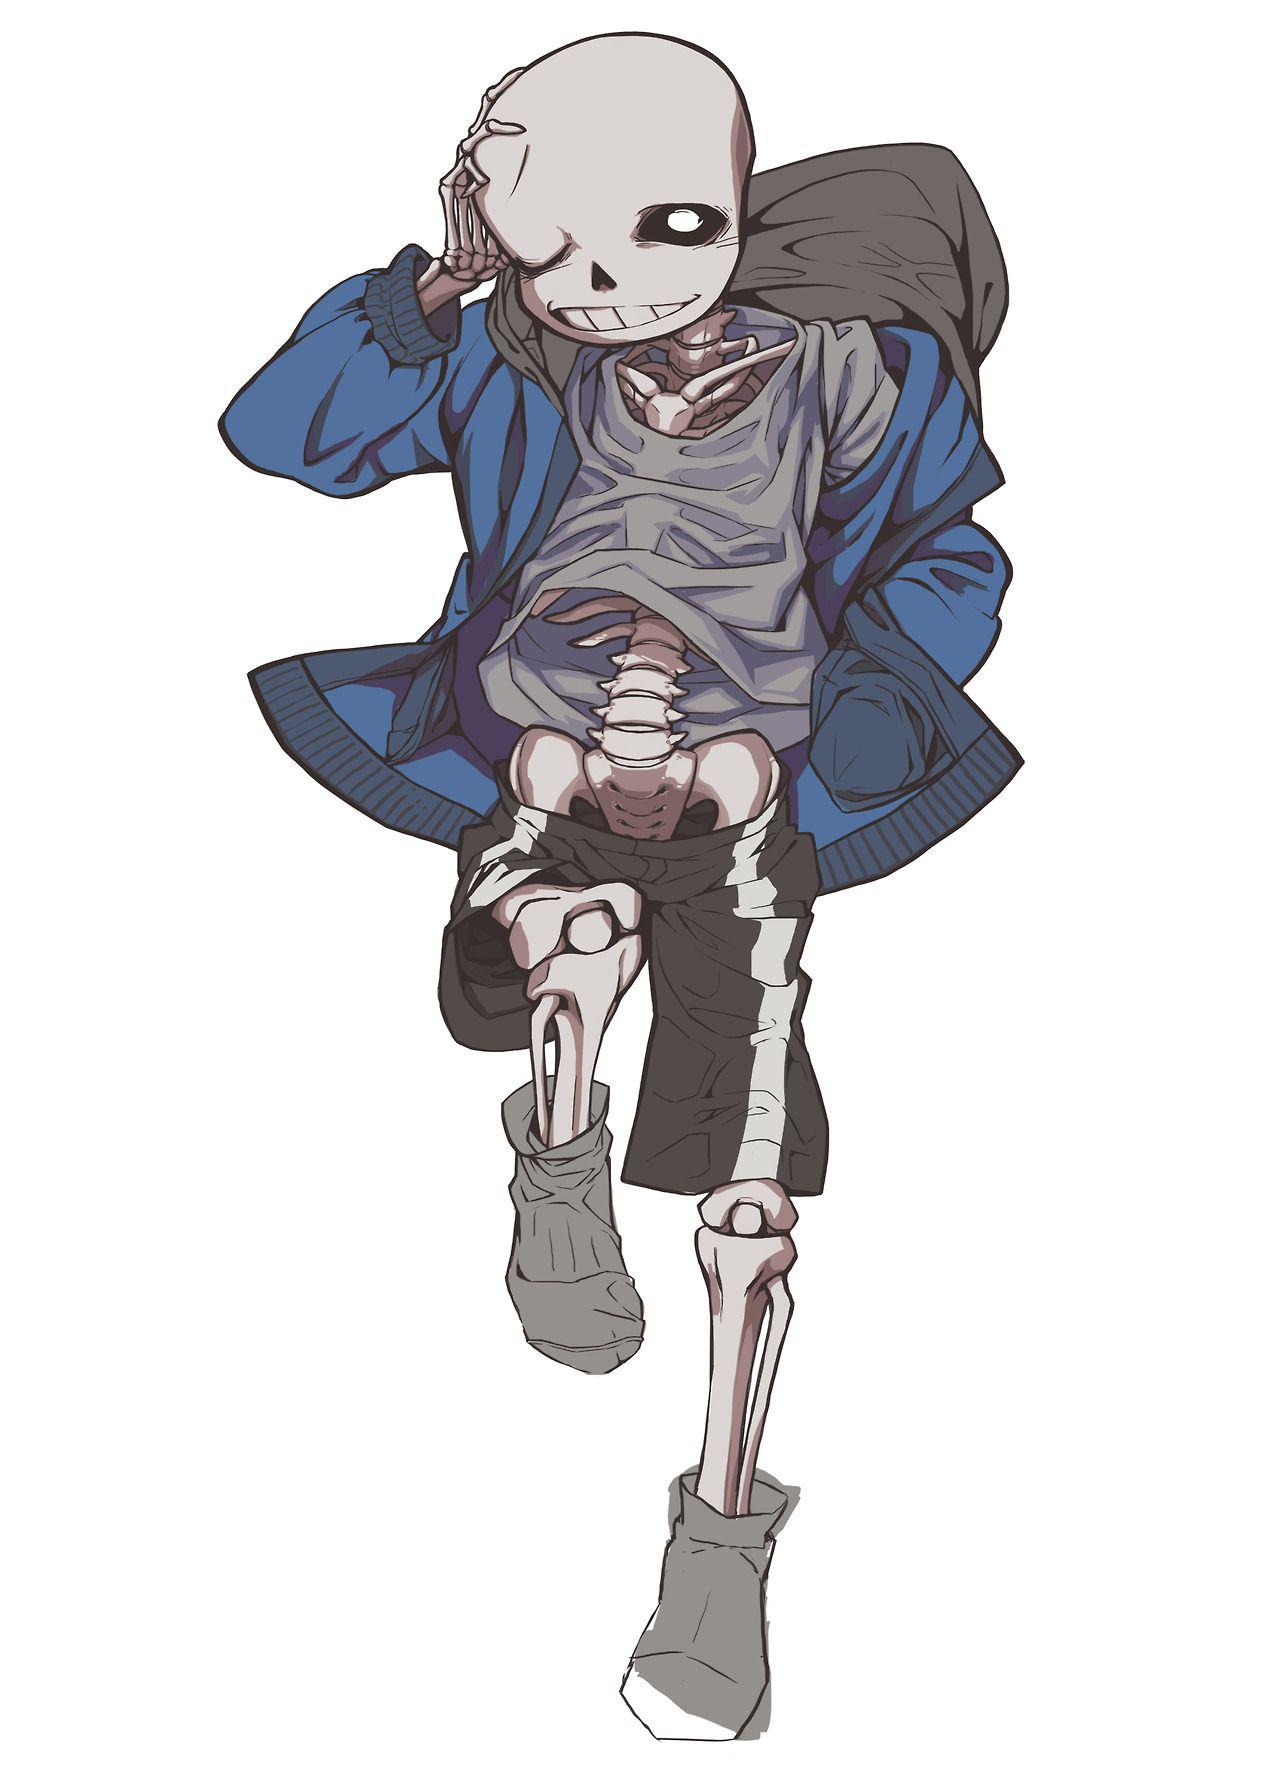 фотографии скелетов из андертейл